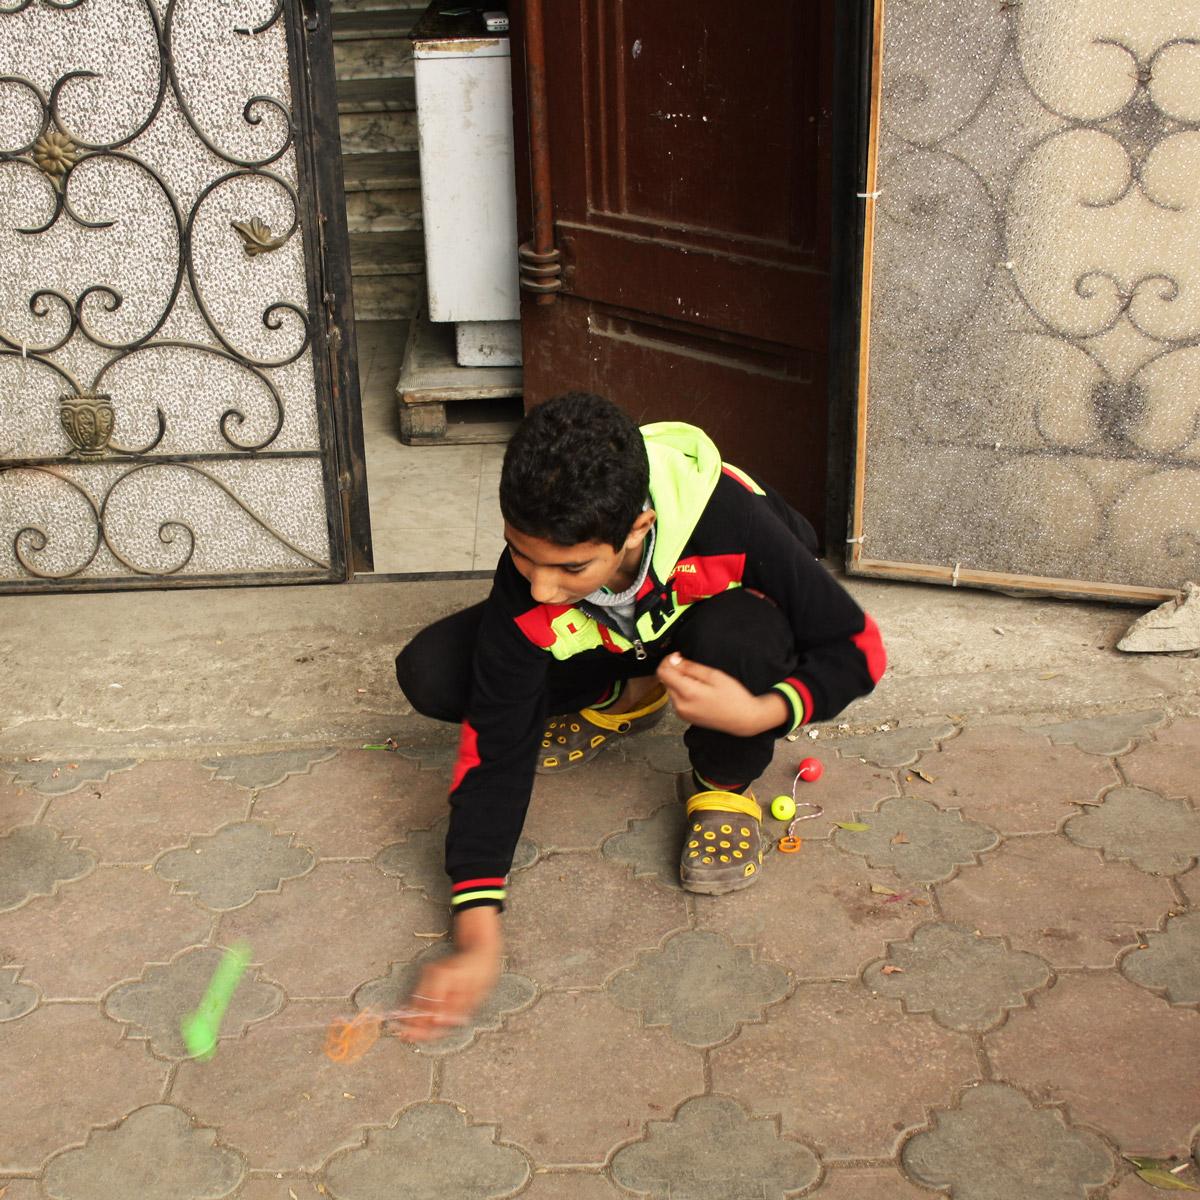 A boy smashing the plastic balls on the concrete.